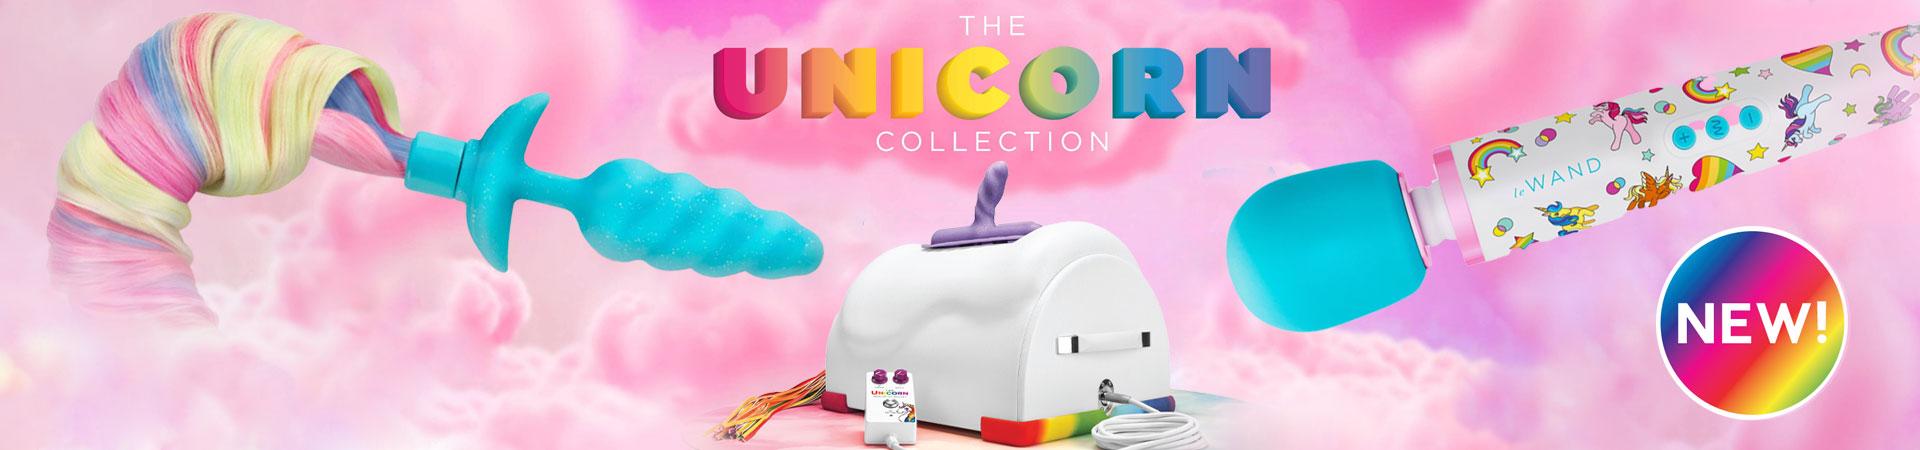 New Unicorn Collection!